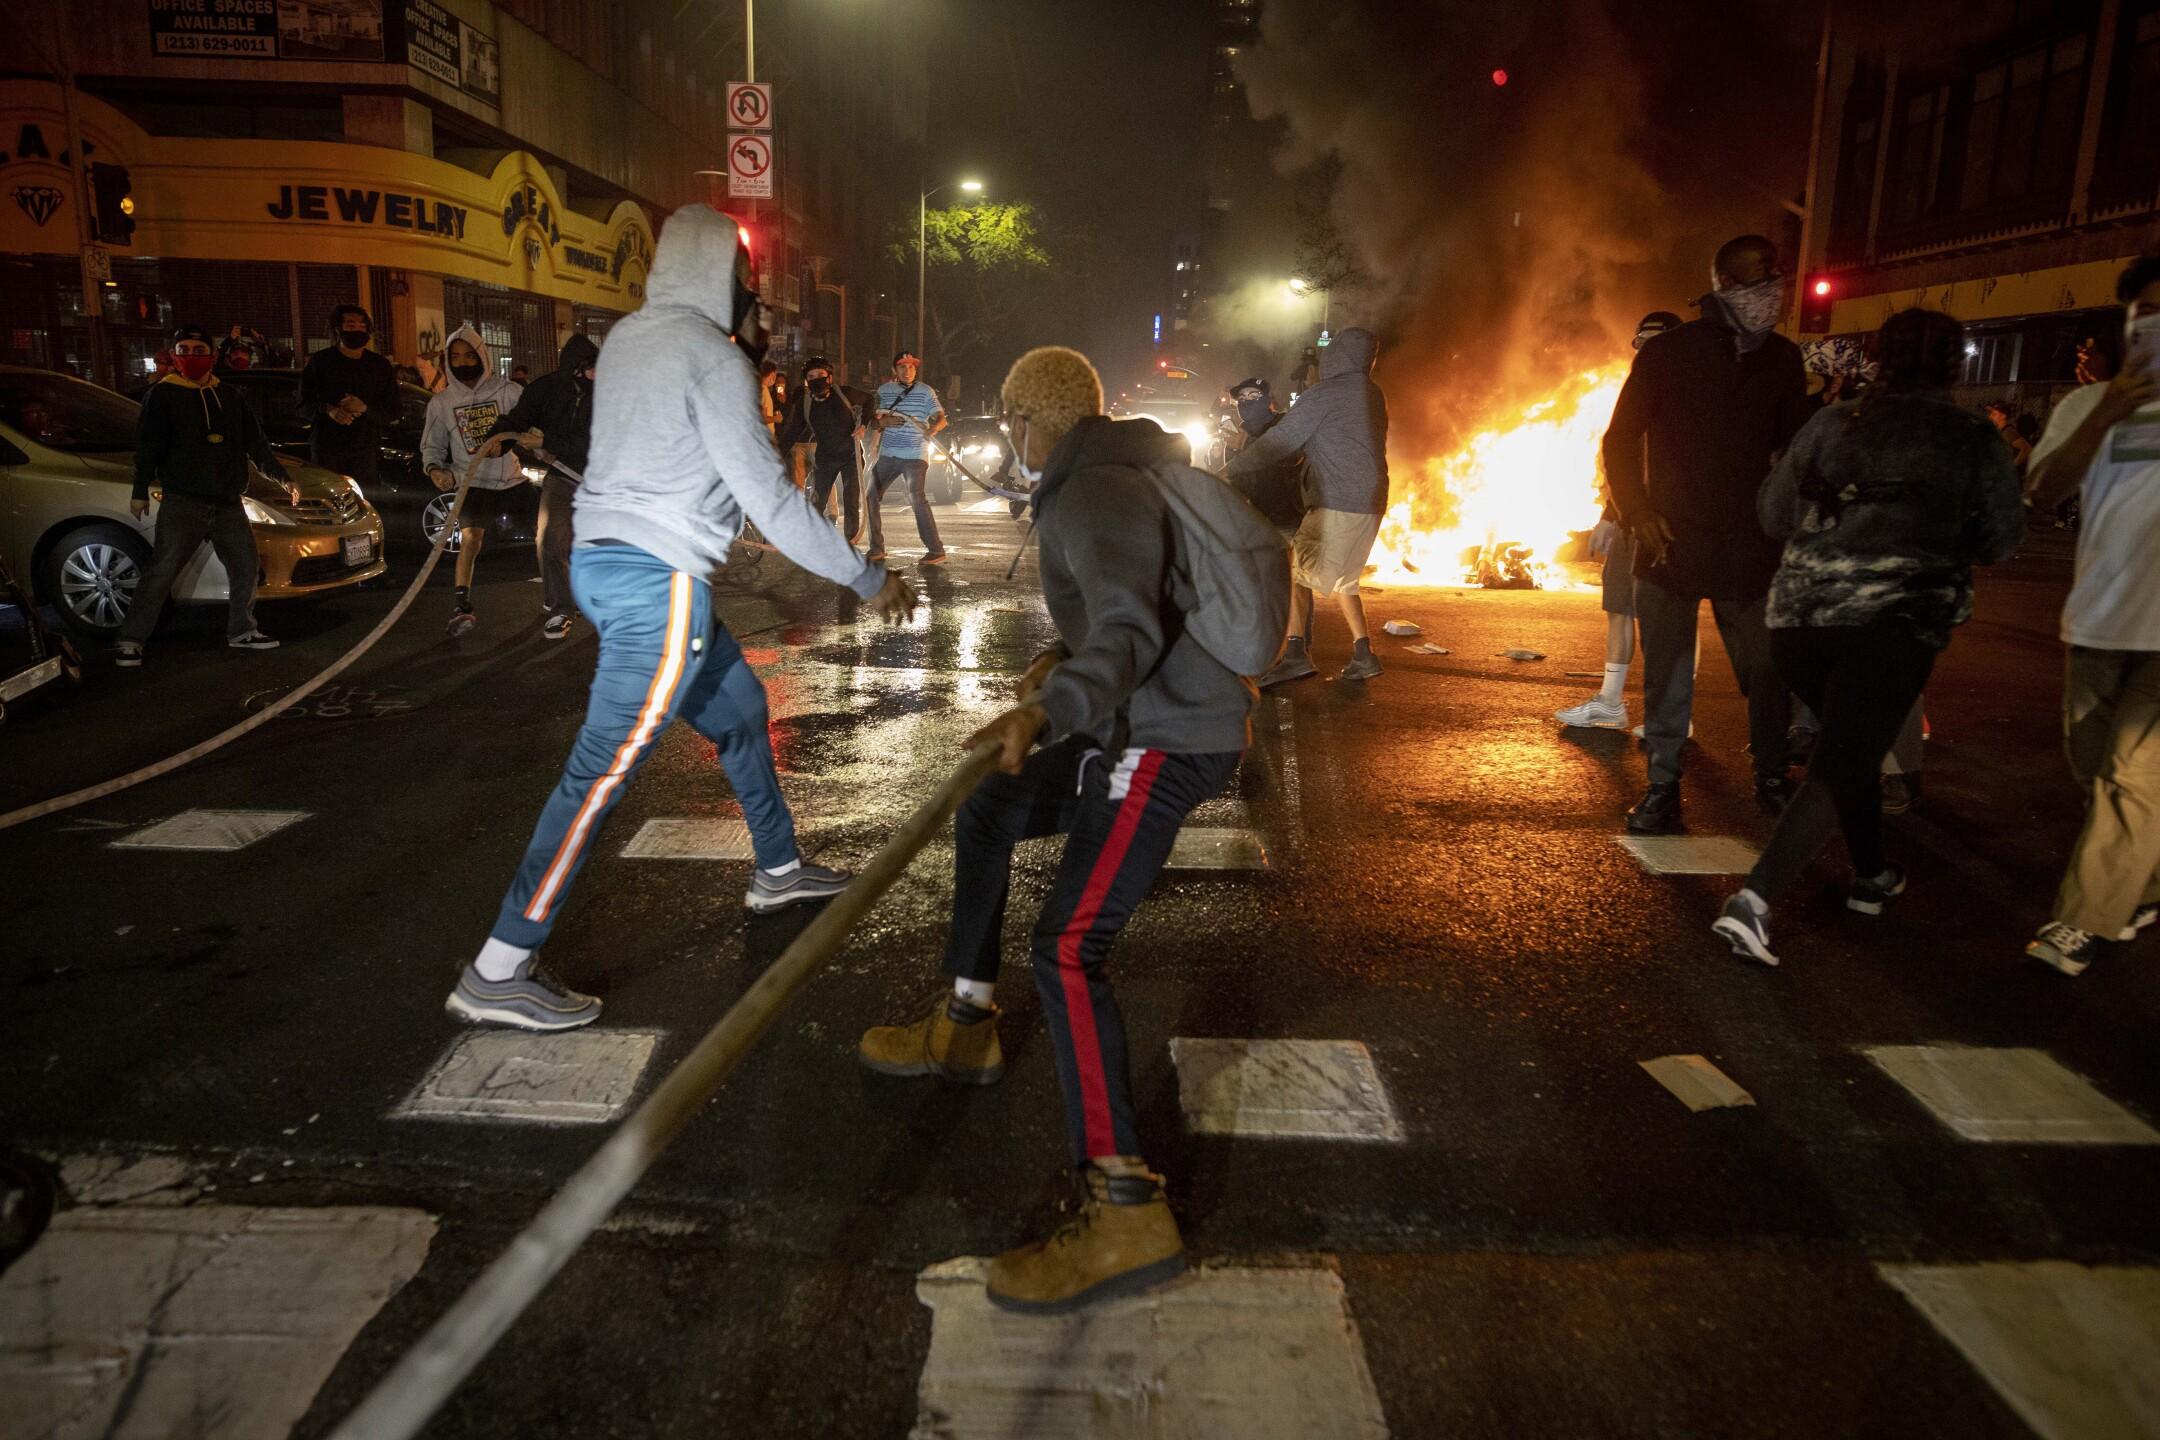 Minneapolics Police Death Los Angeles